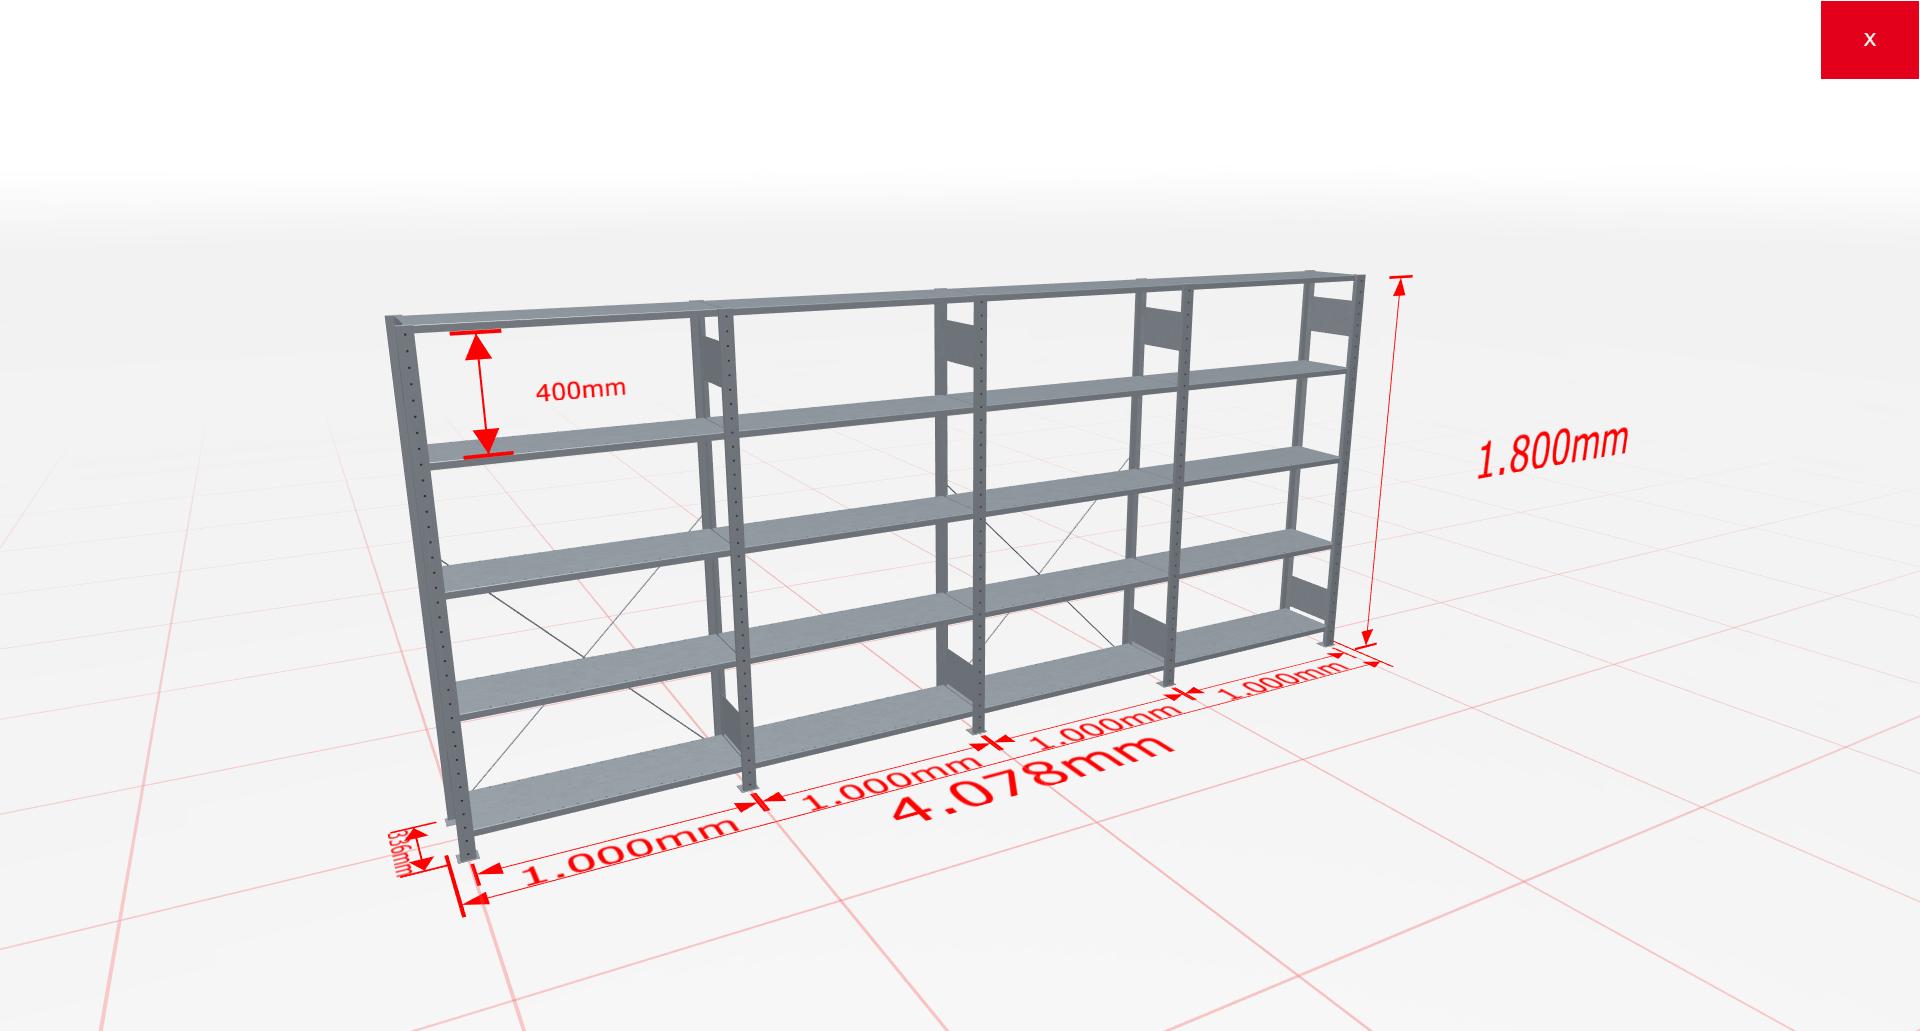 Fachbodenregal Komplettregal 1800x3072x300 mm (HxBxT) SCHULTE Lagertechnik verzinkt 5 Ebenen  150 kg je Boden